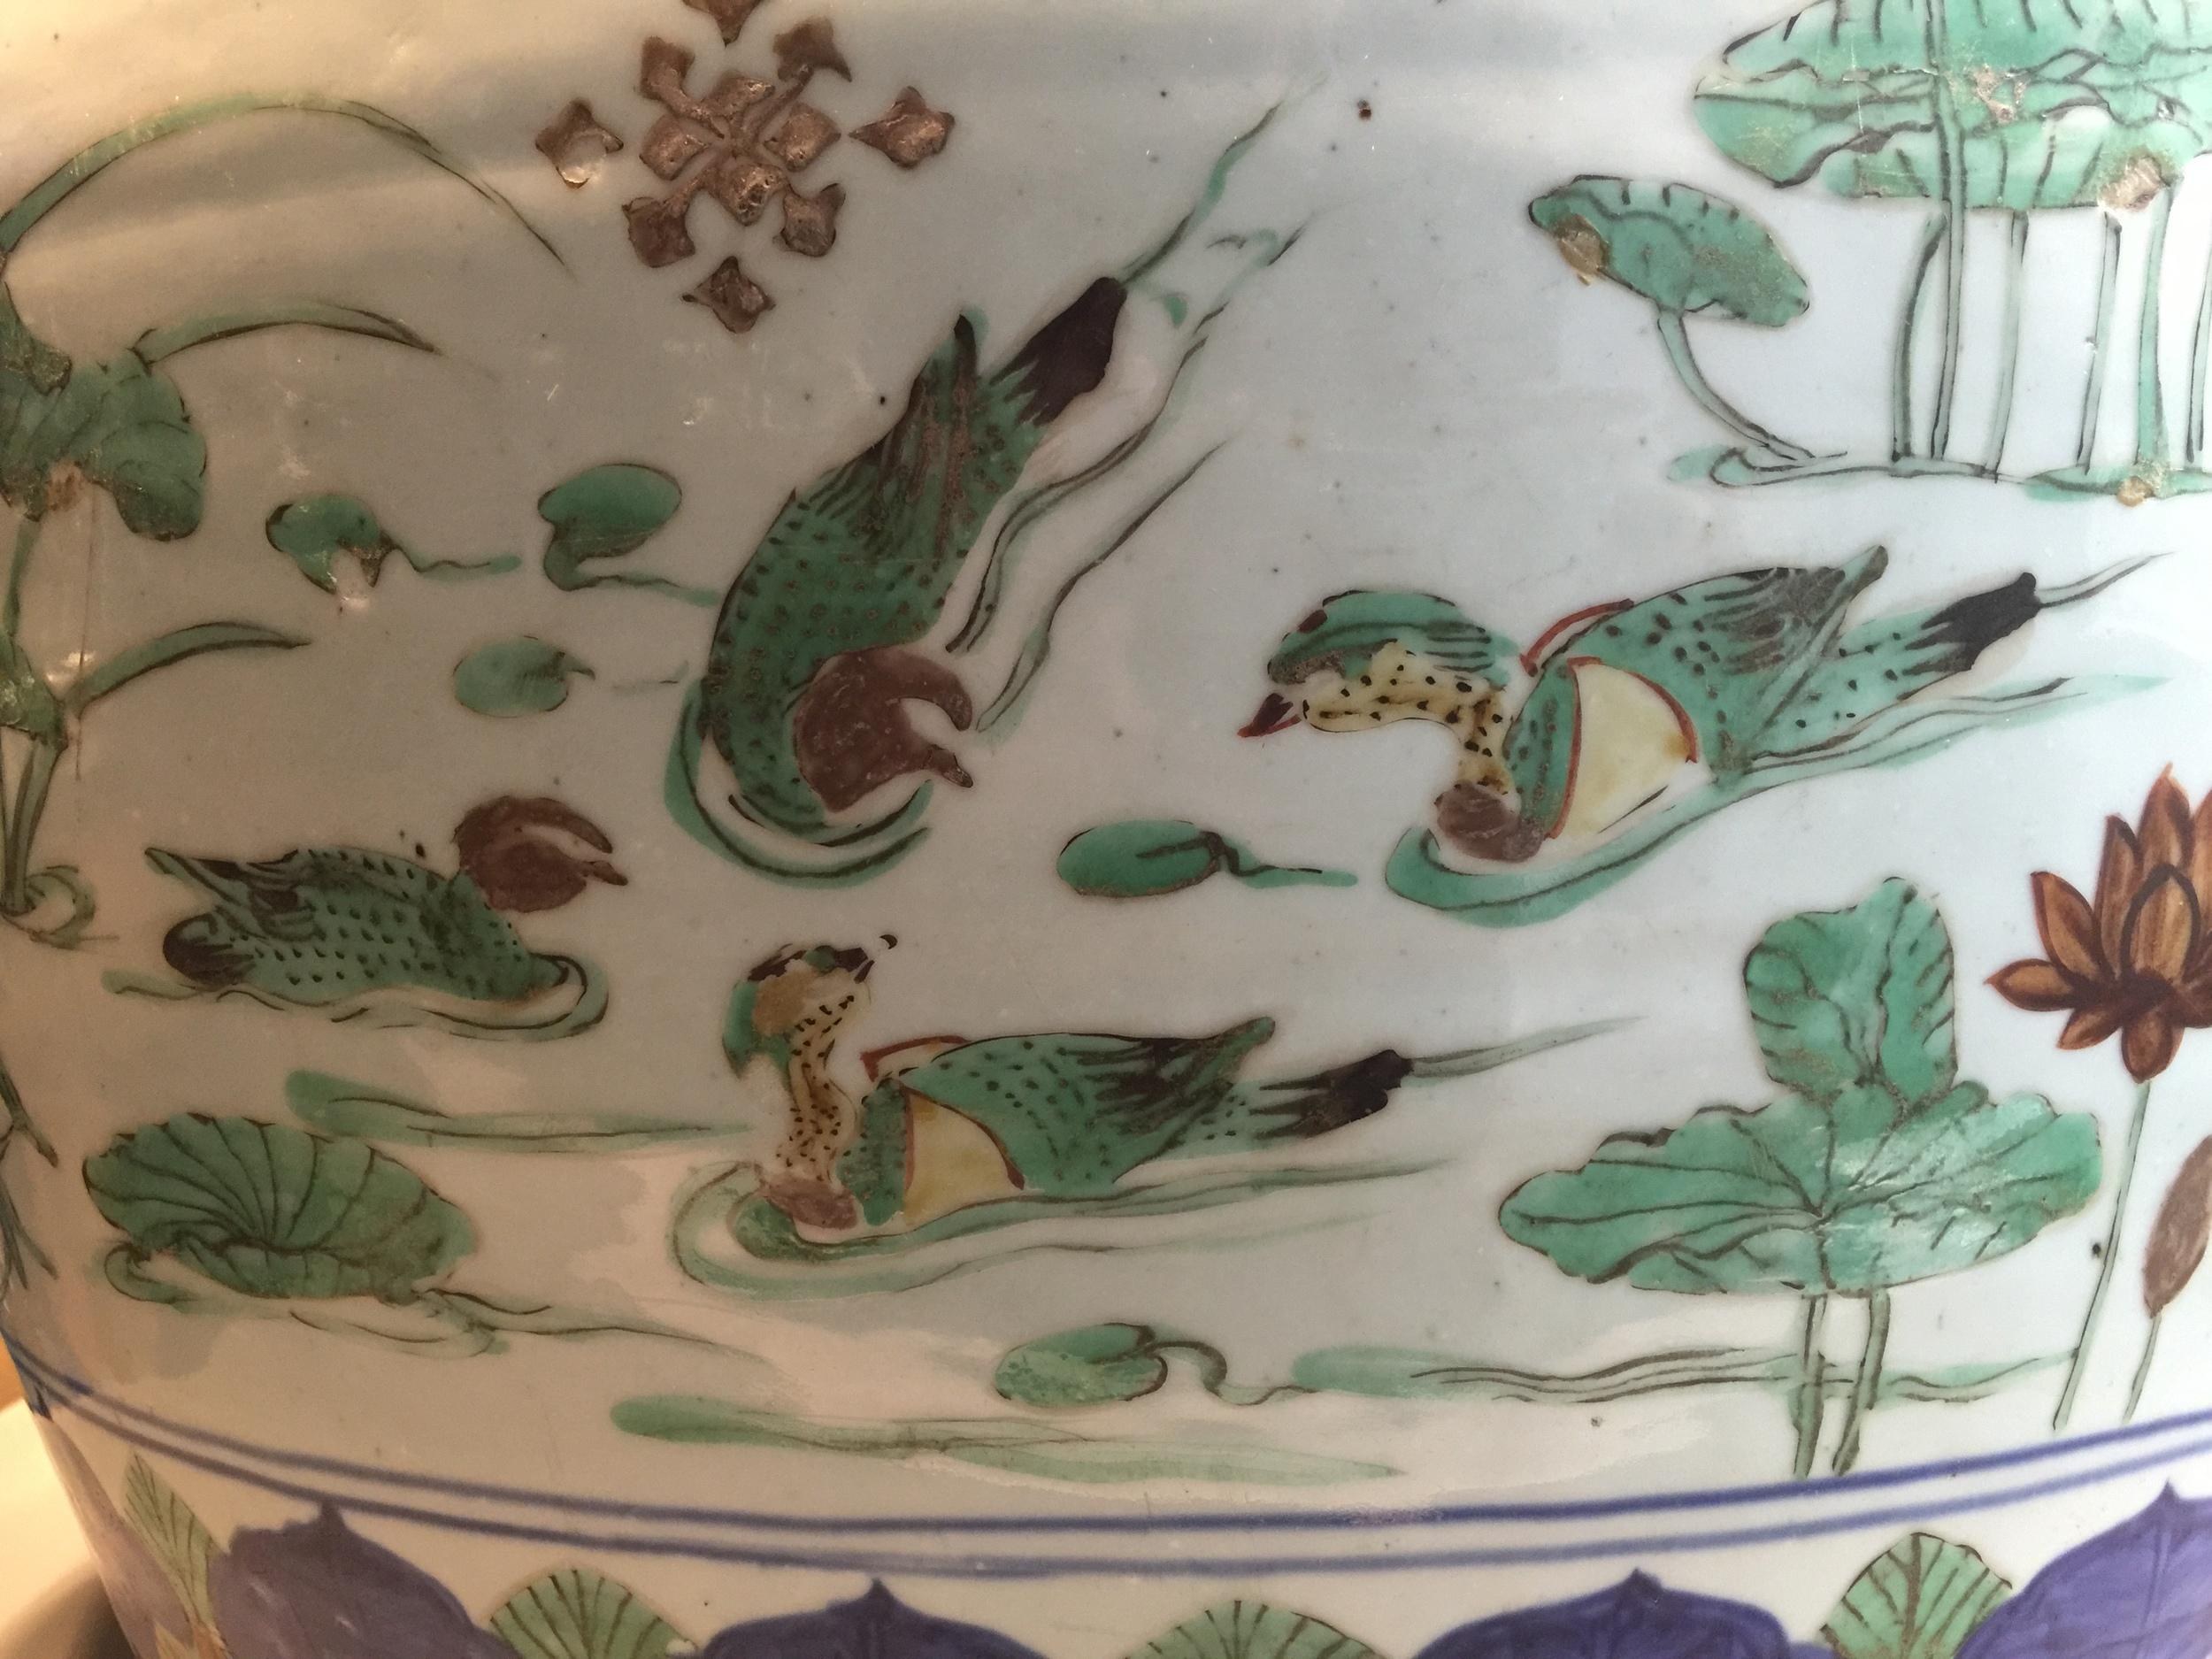 Chinese-Porcelain-British-Museum-Percival-David-jessewaugh.com-25.jpg